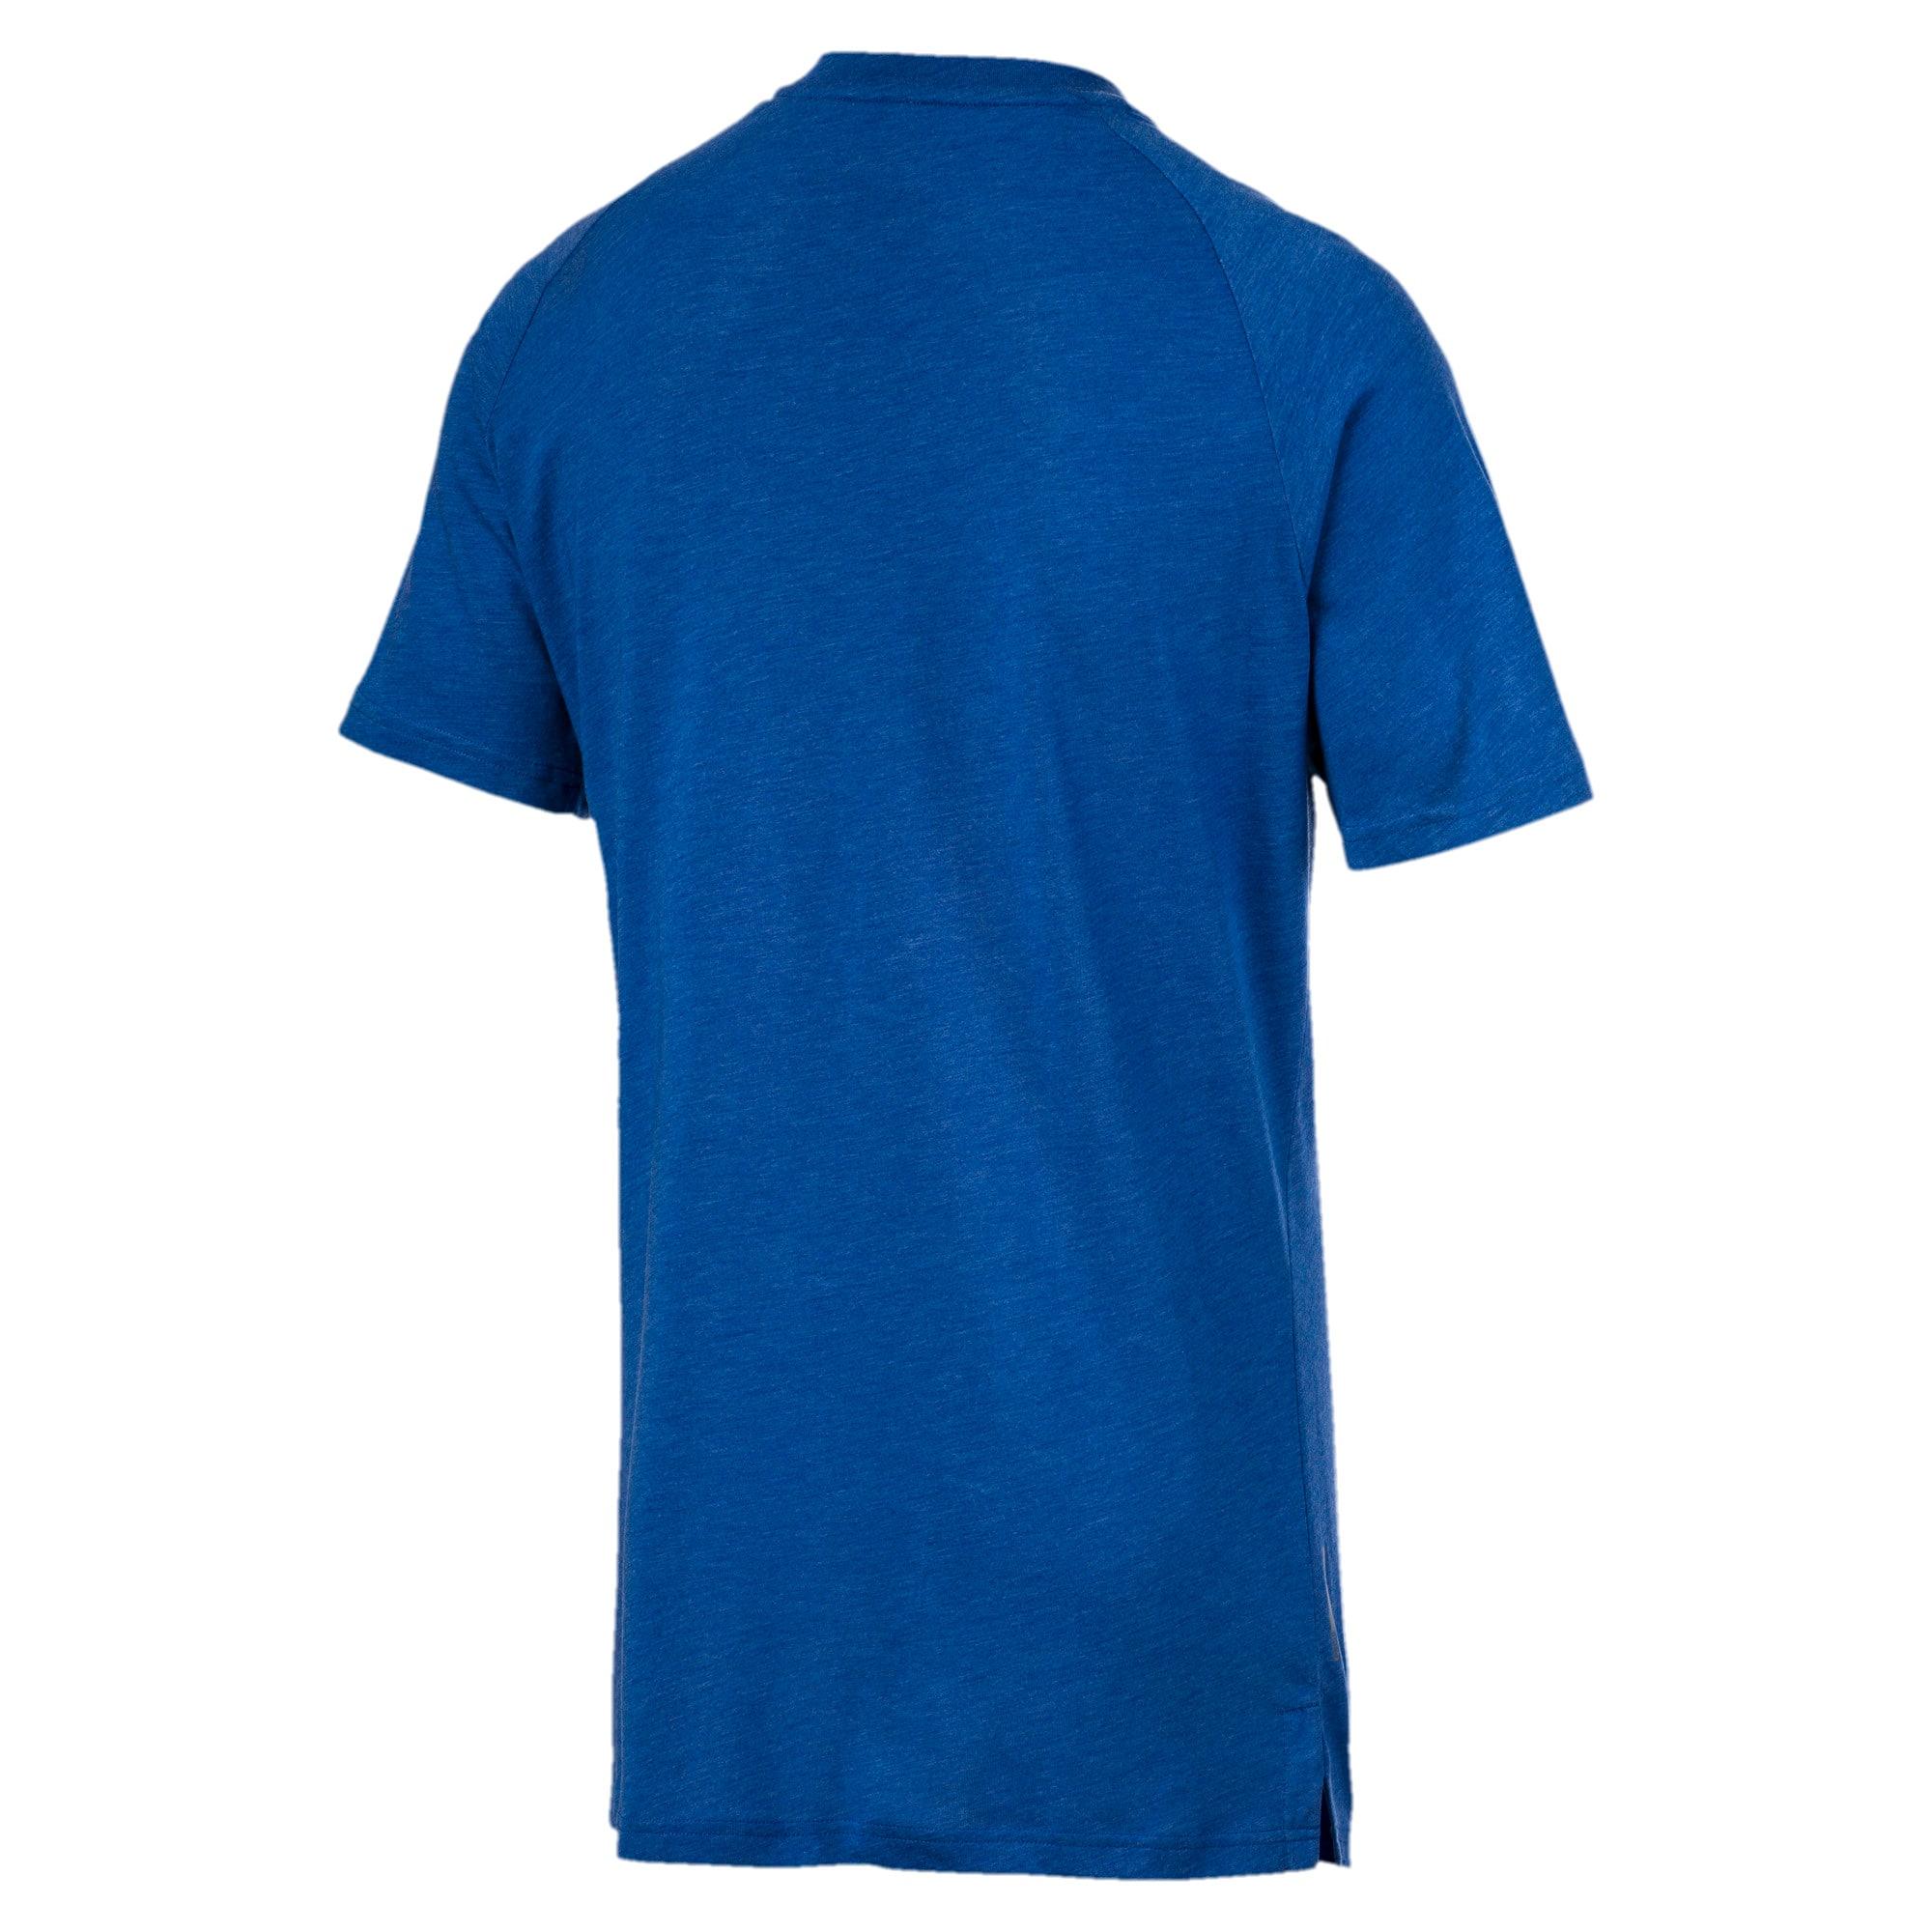 Thumbnail 5 of T-Shirt Reactive pour homme, Galaxy Blue Heather, medium